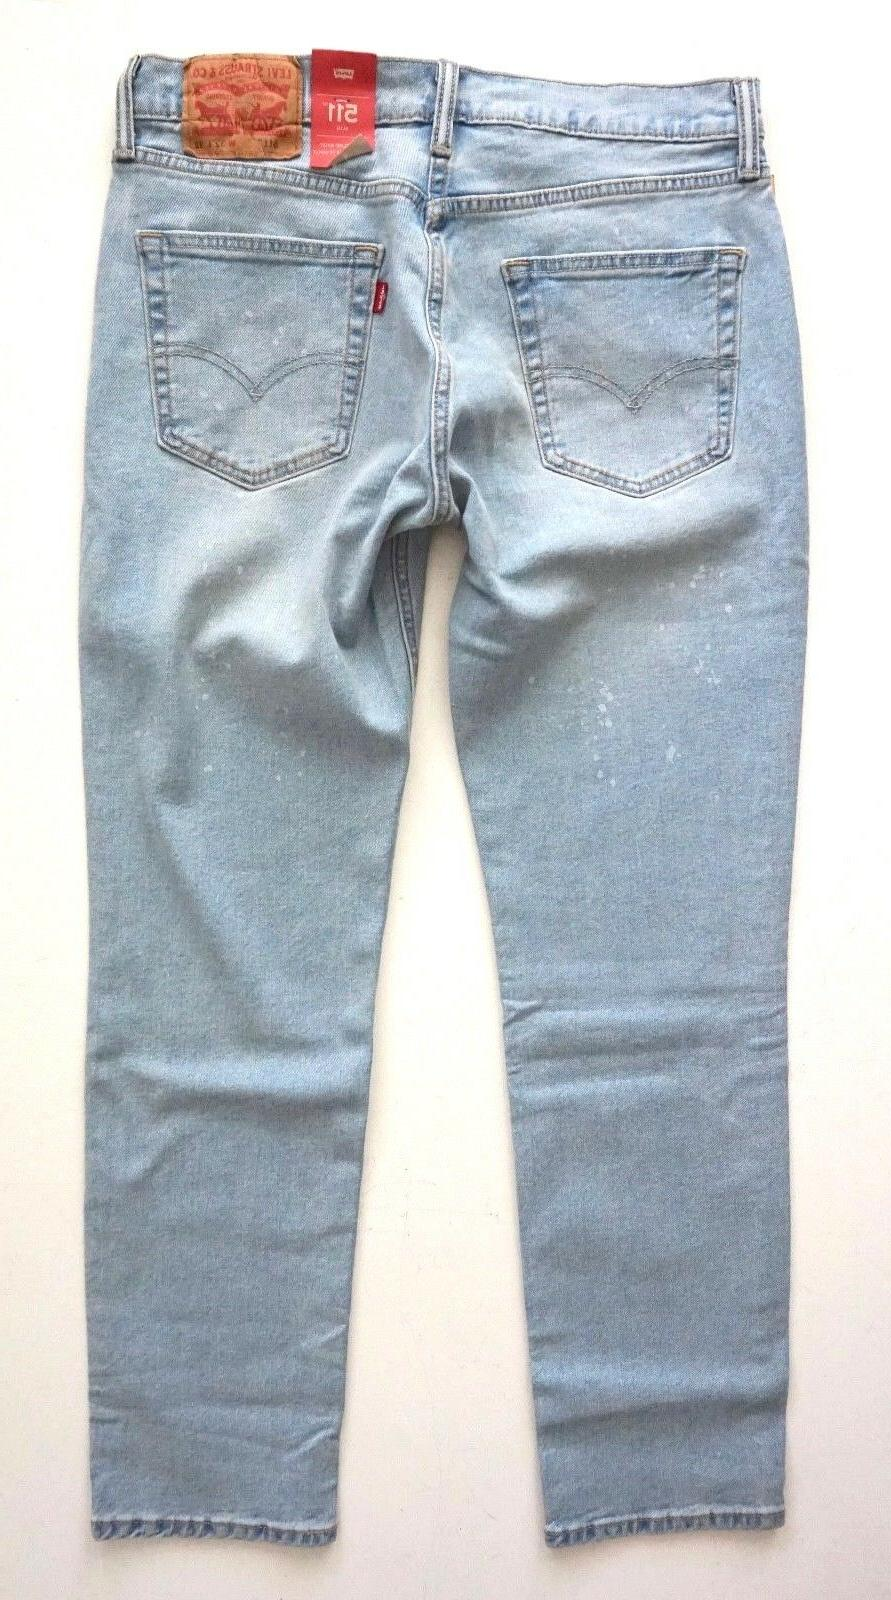 Levi's Levis Mens 511 Slim Crystal Ball Denim Jeans